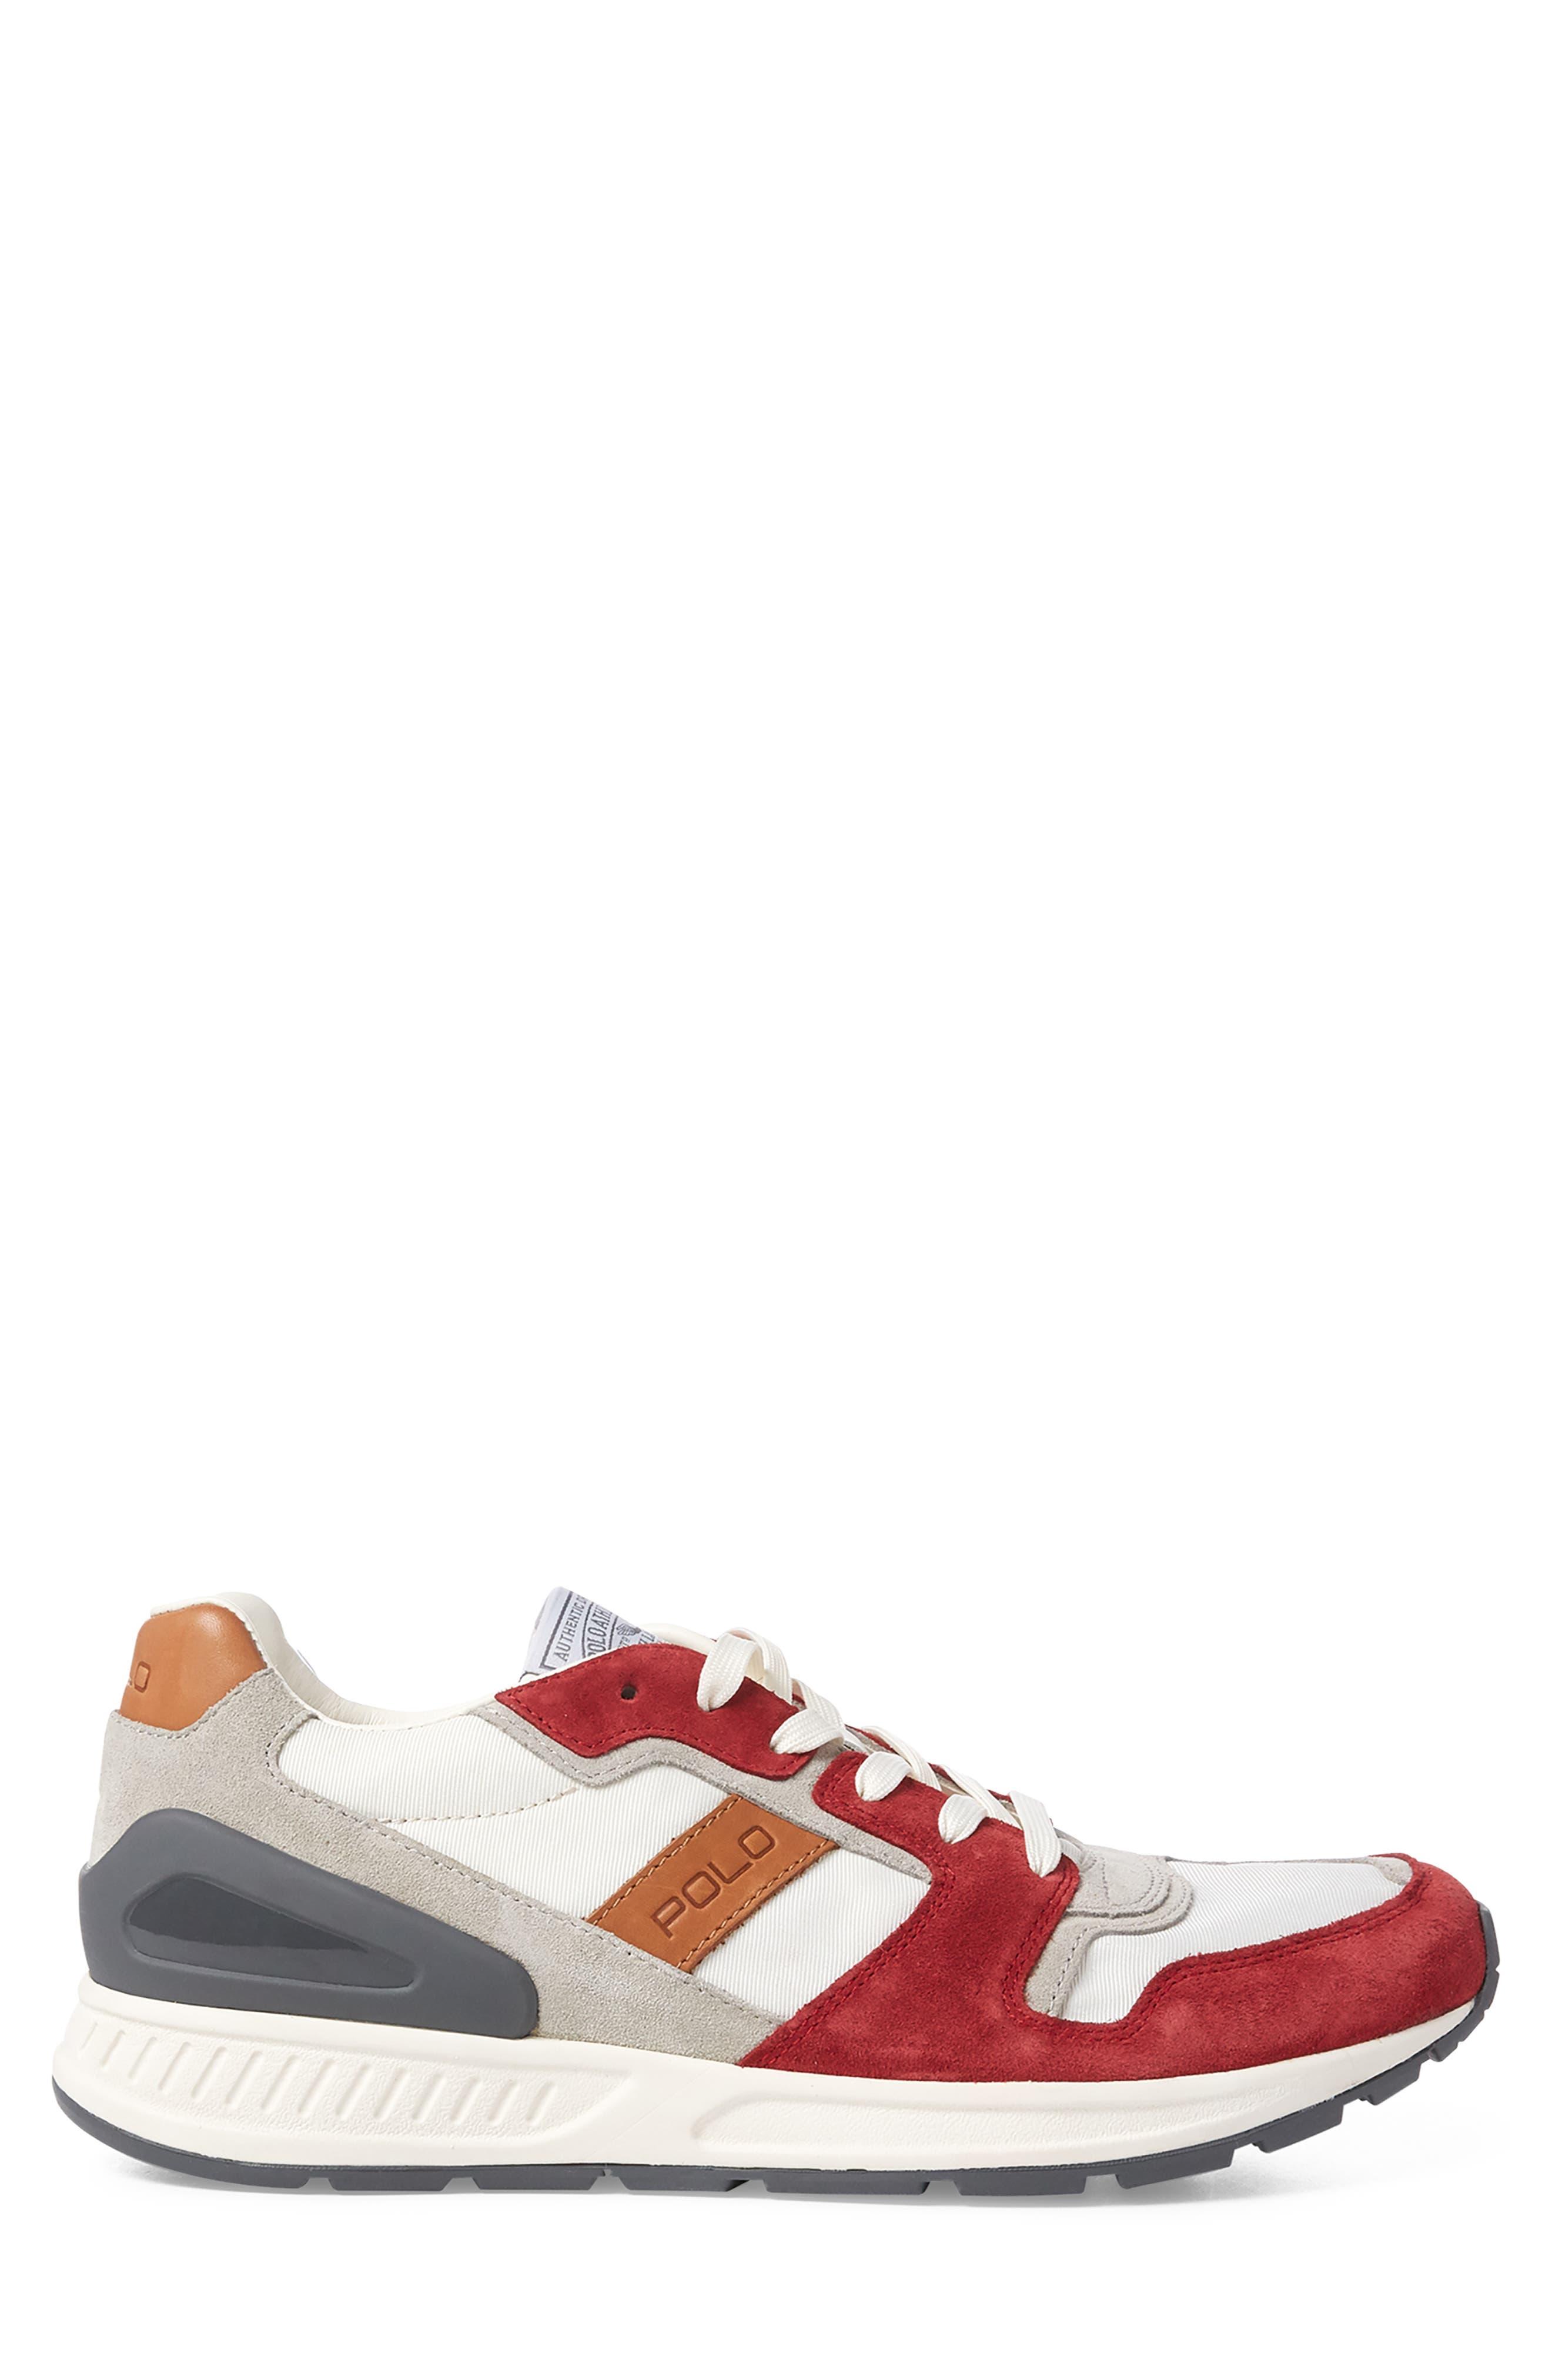 POLO RALPH LAUREN, Train 100 Retro Sneaker, Alternate thumbnail 2, color, RED NYLON/ SUEDE